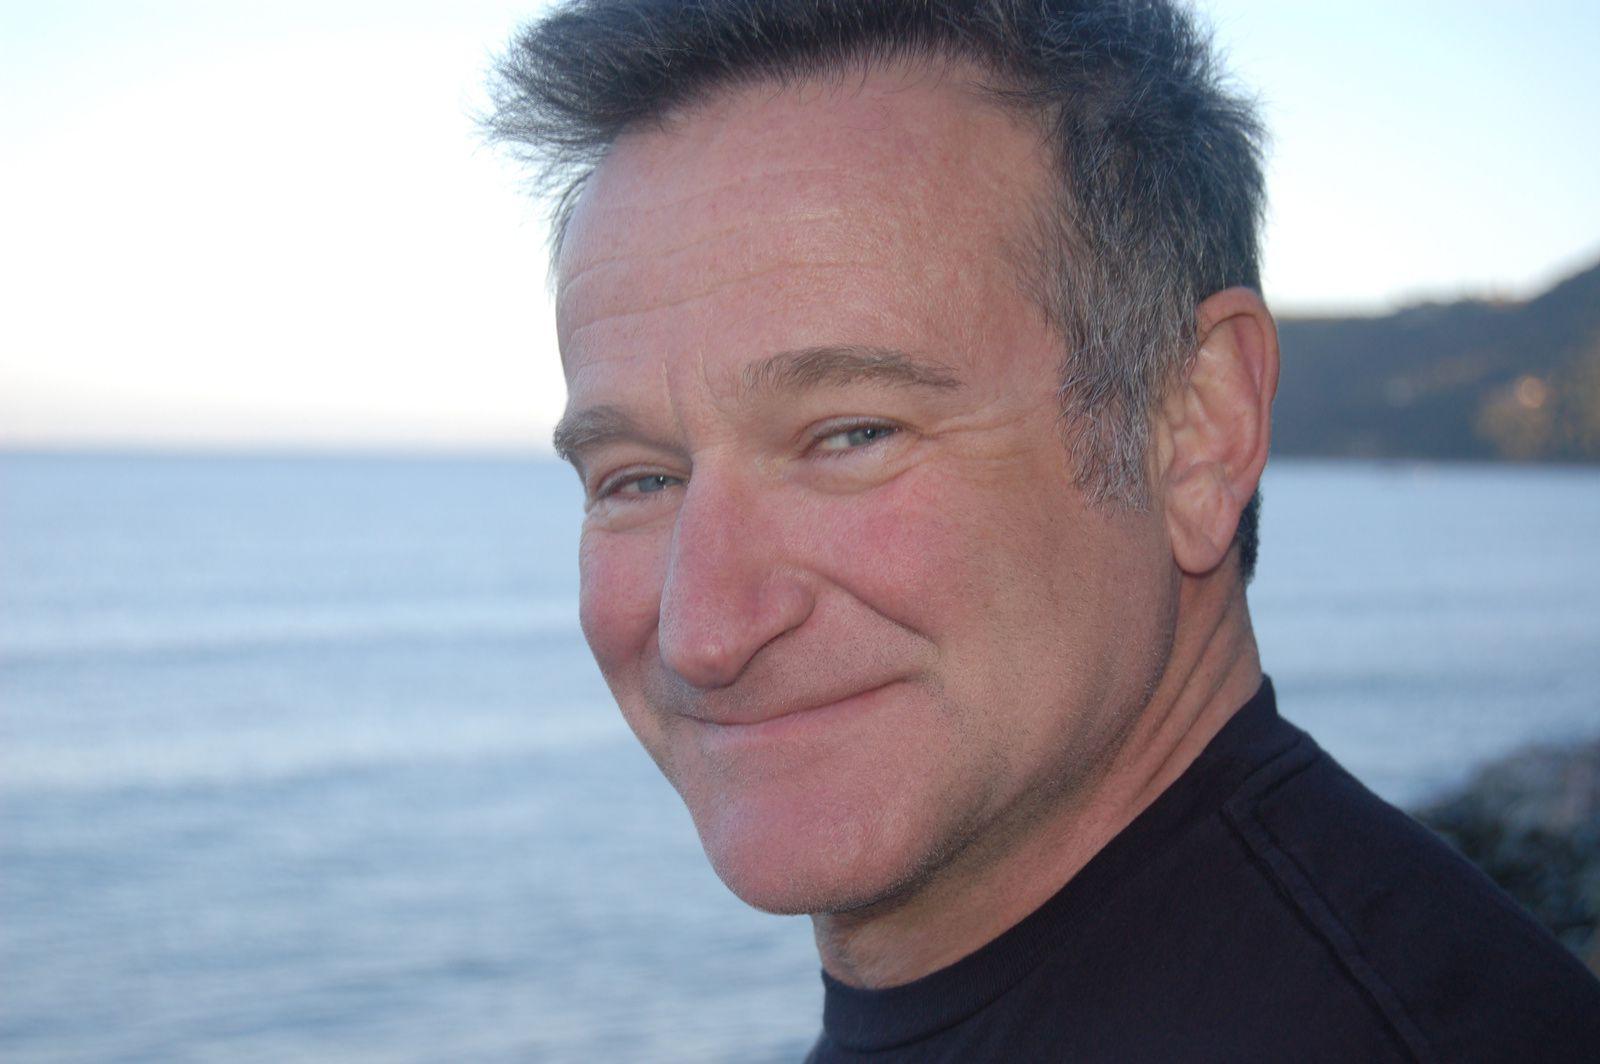 Robin Williams, le clown triste, a disparu